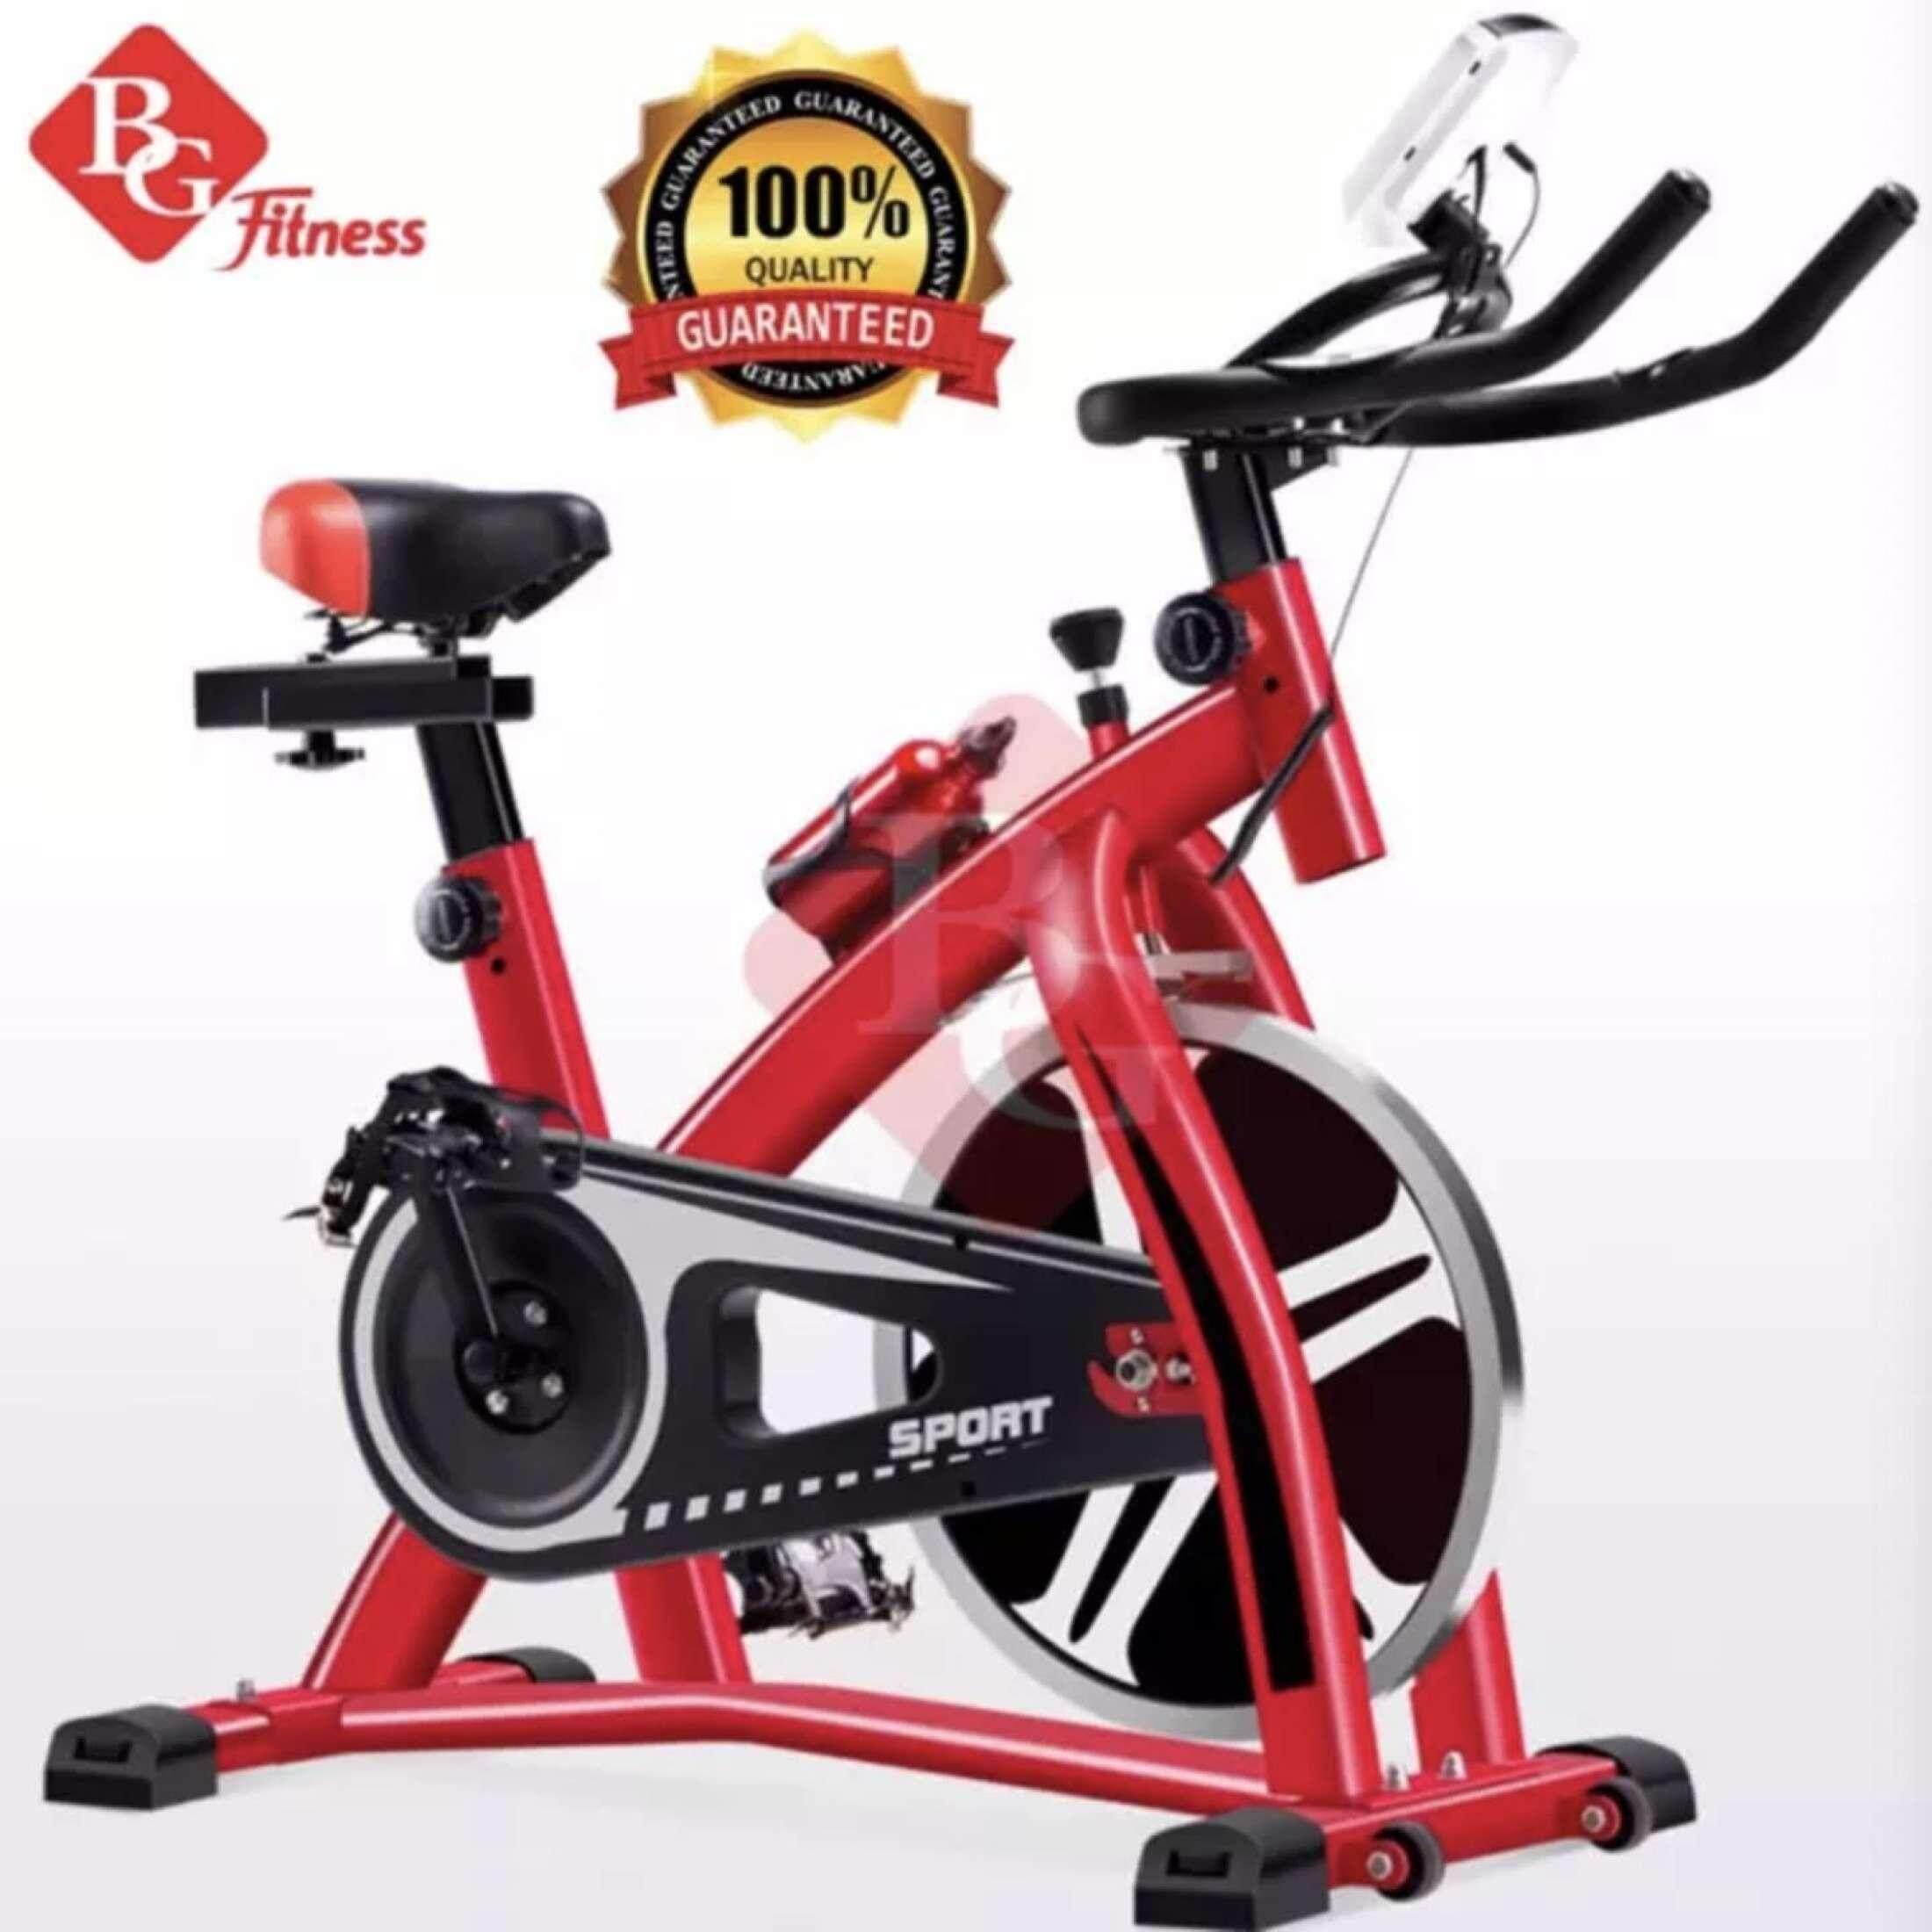 B&G จักรยานออกกำลังกาย Spin Bike พร้อมหน้าจอ LED แสดงผลการทำงาน รุ่น S300 (Red)